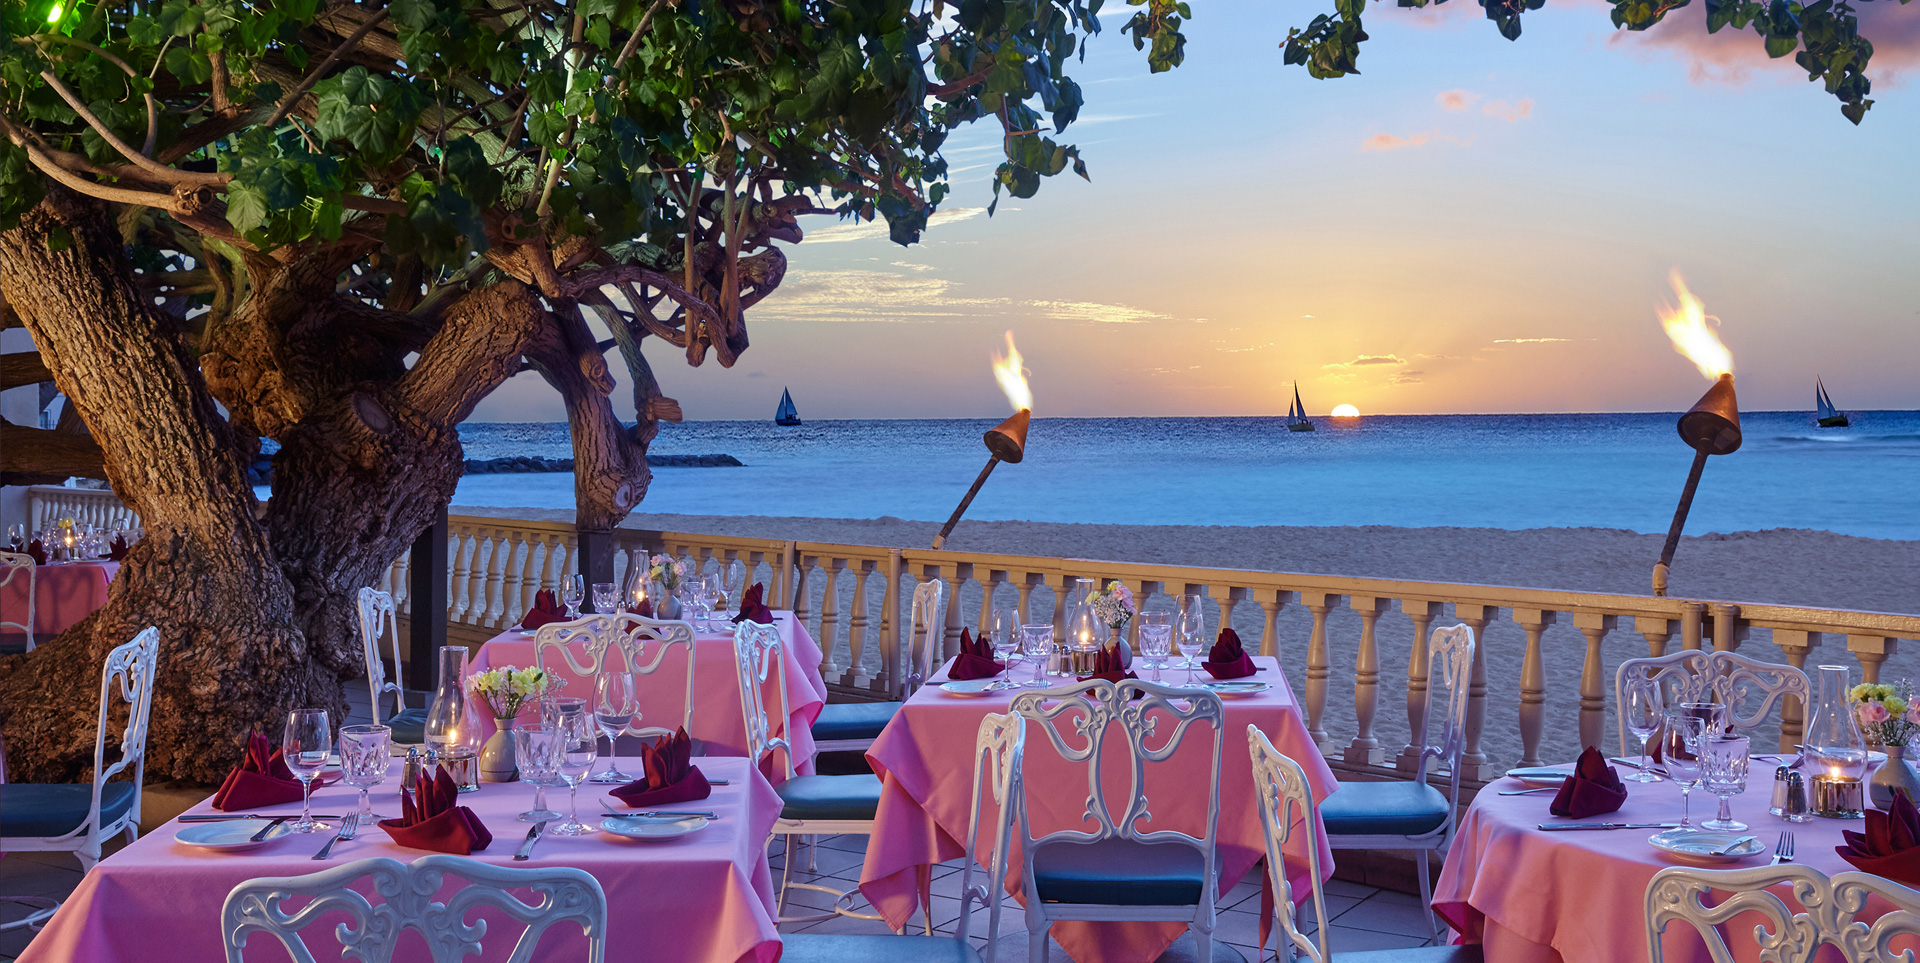 Hau Tree Lanai Restaurant at New Otani Kaimana Beach Hotel